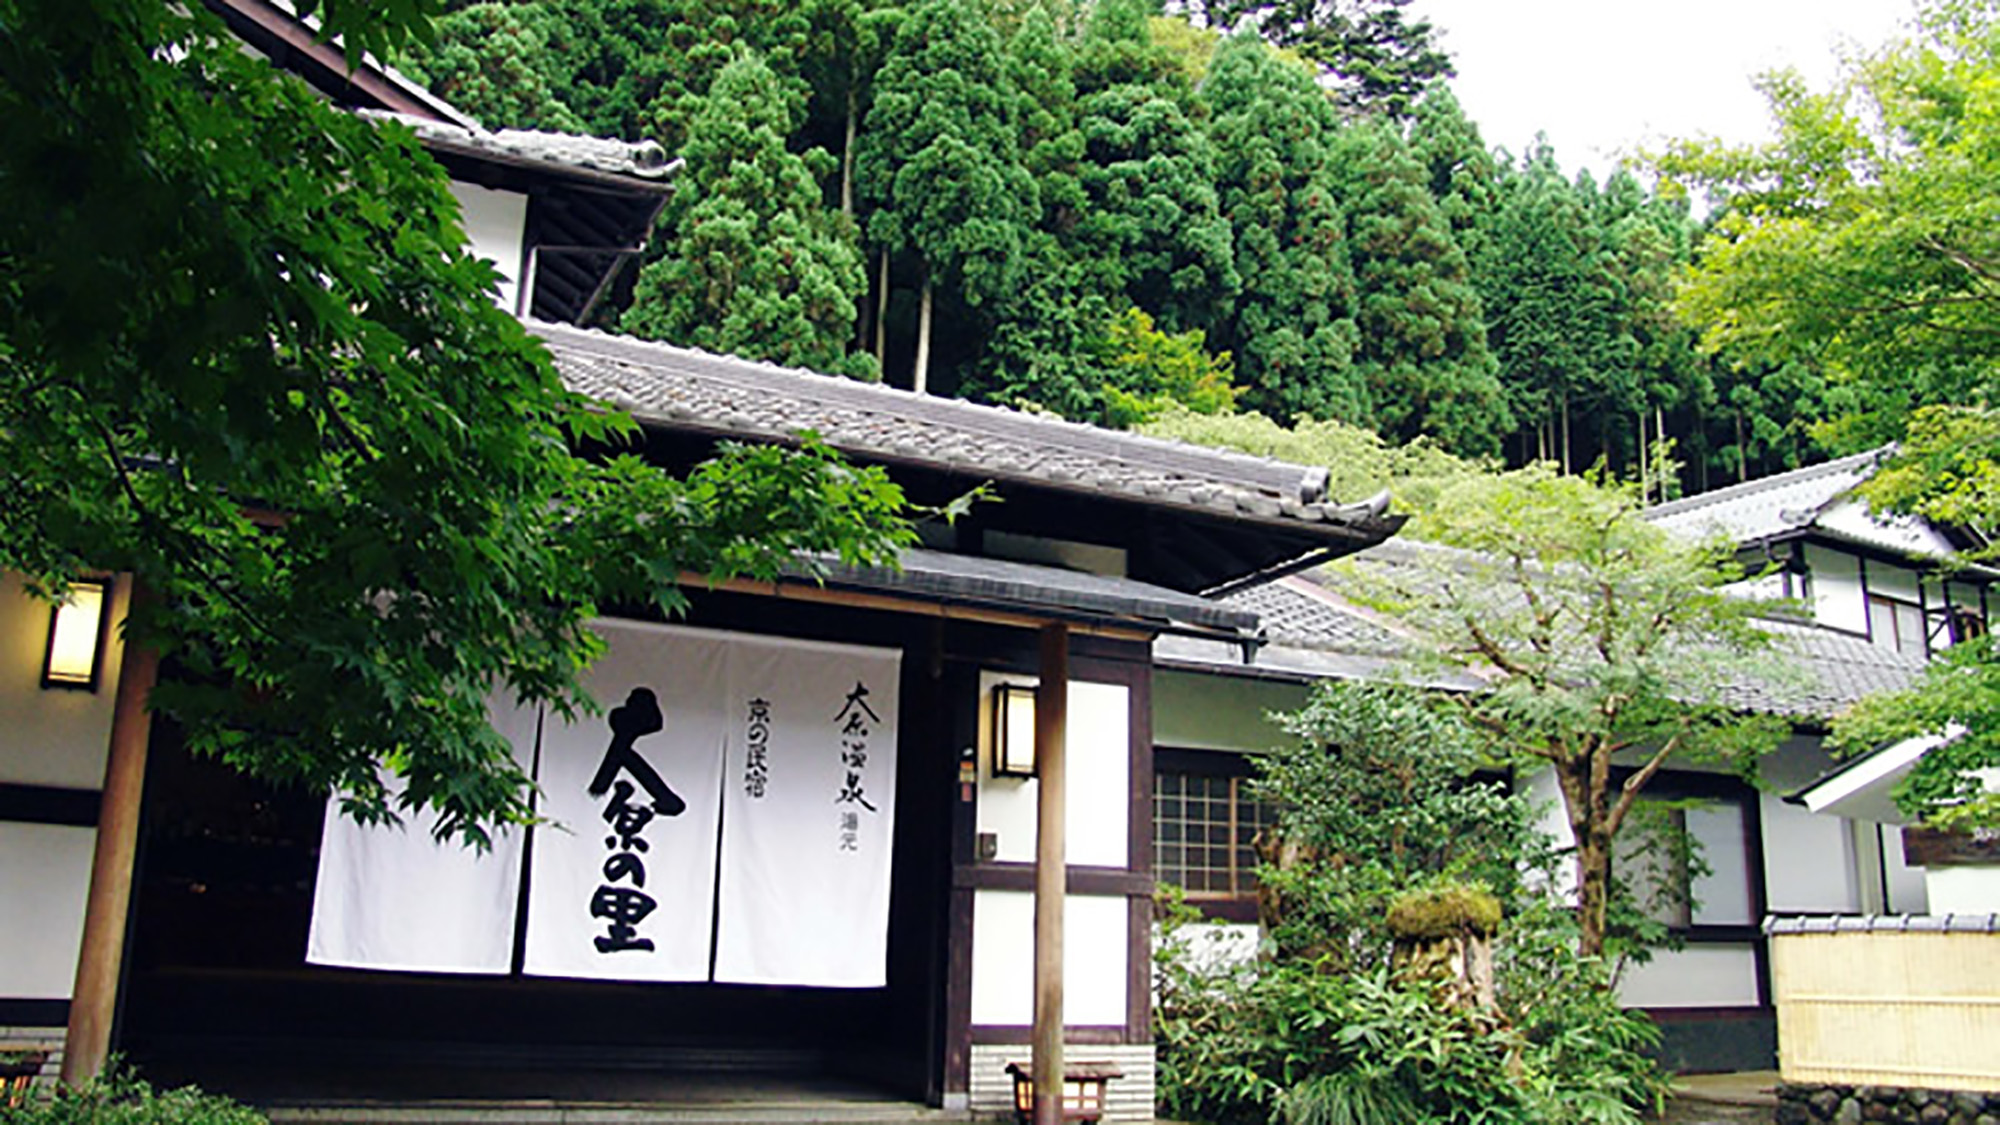 京都大原の民宿〜100年続く希少味噌〜大原温泉 大原の里